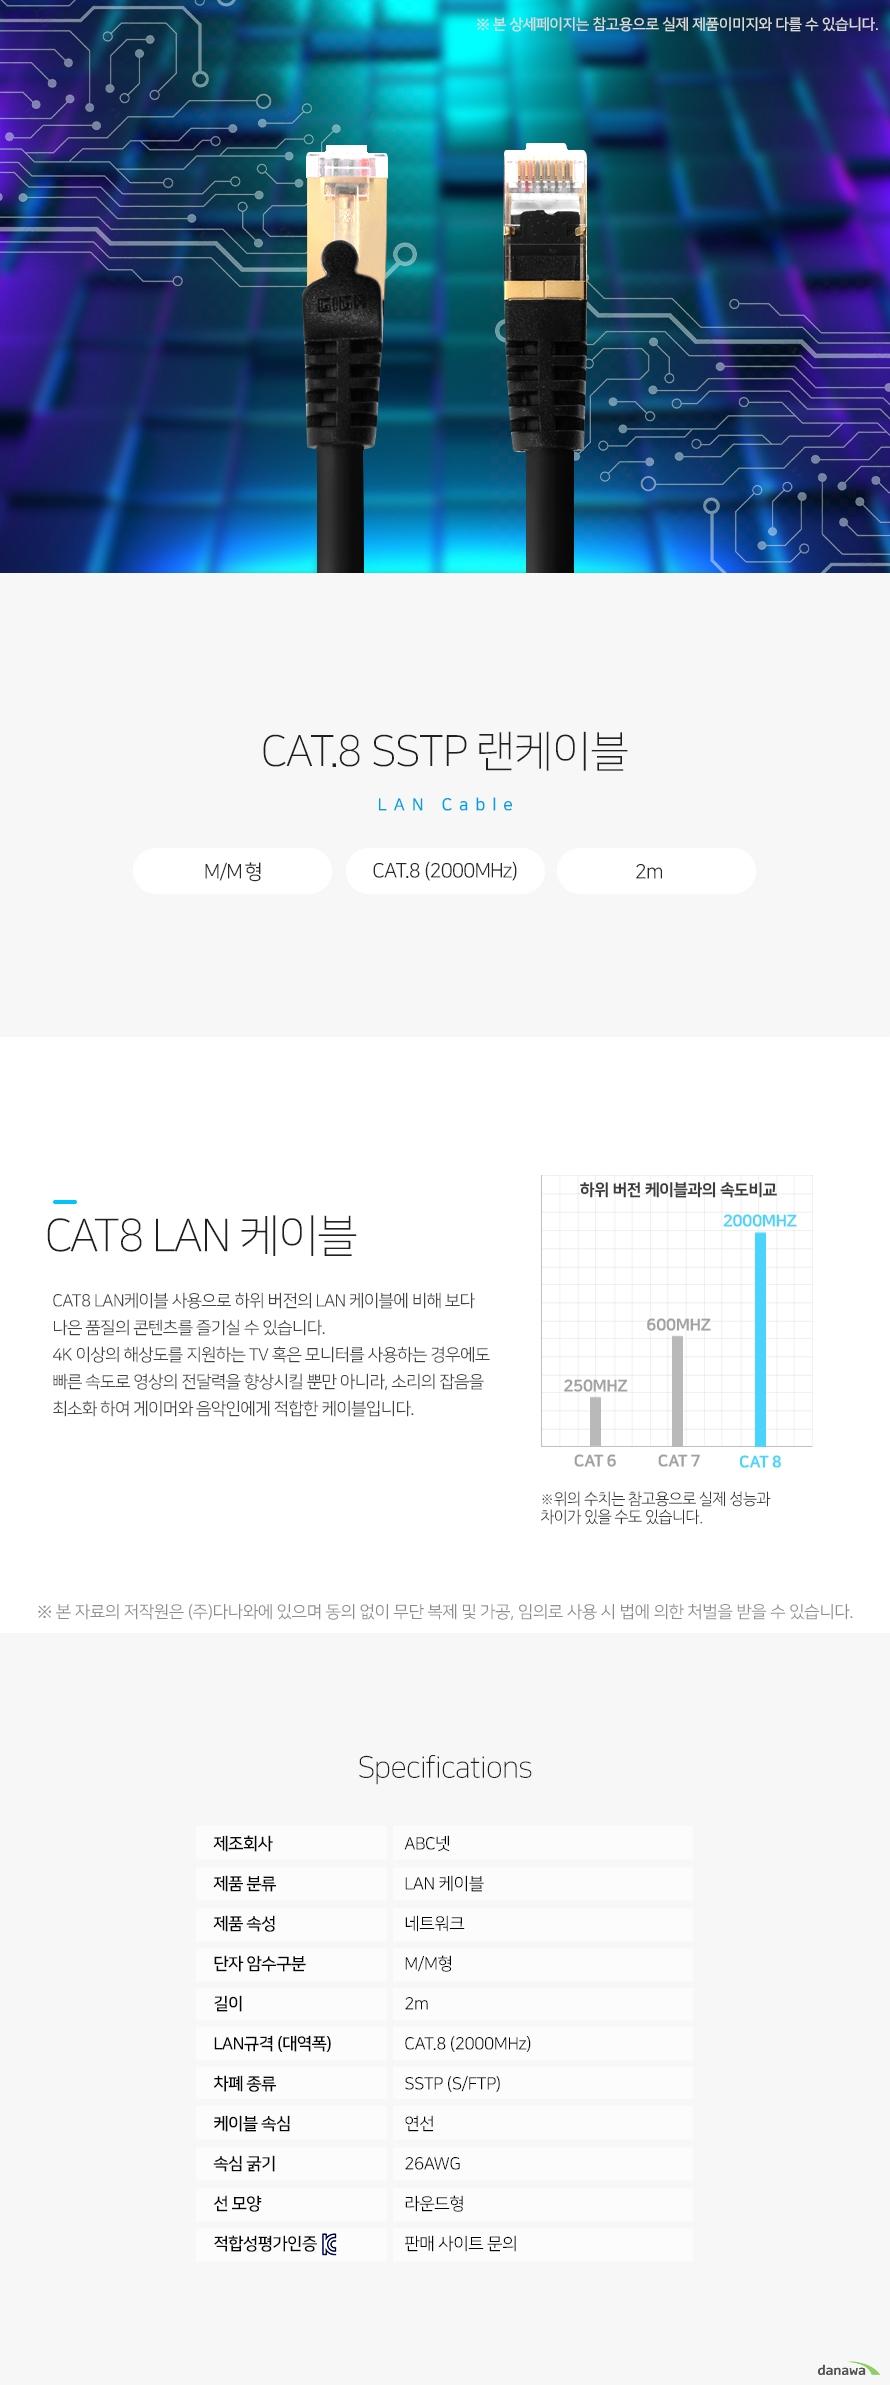 ABC넷 CAT.8 SSTP 랜케이블 (2m) 상세 스펙 LAN 케이블 / 네트워크 / M/M형 / CAT.8 (2000MHz) / SSTP (S/FTP) / 연선 / 26AWG / 라운드형 / RJ45 / RJ45